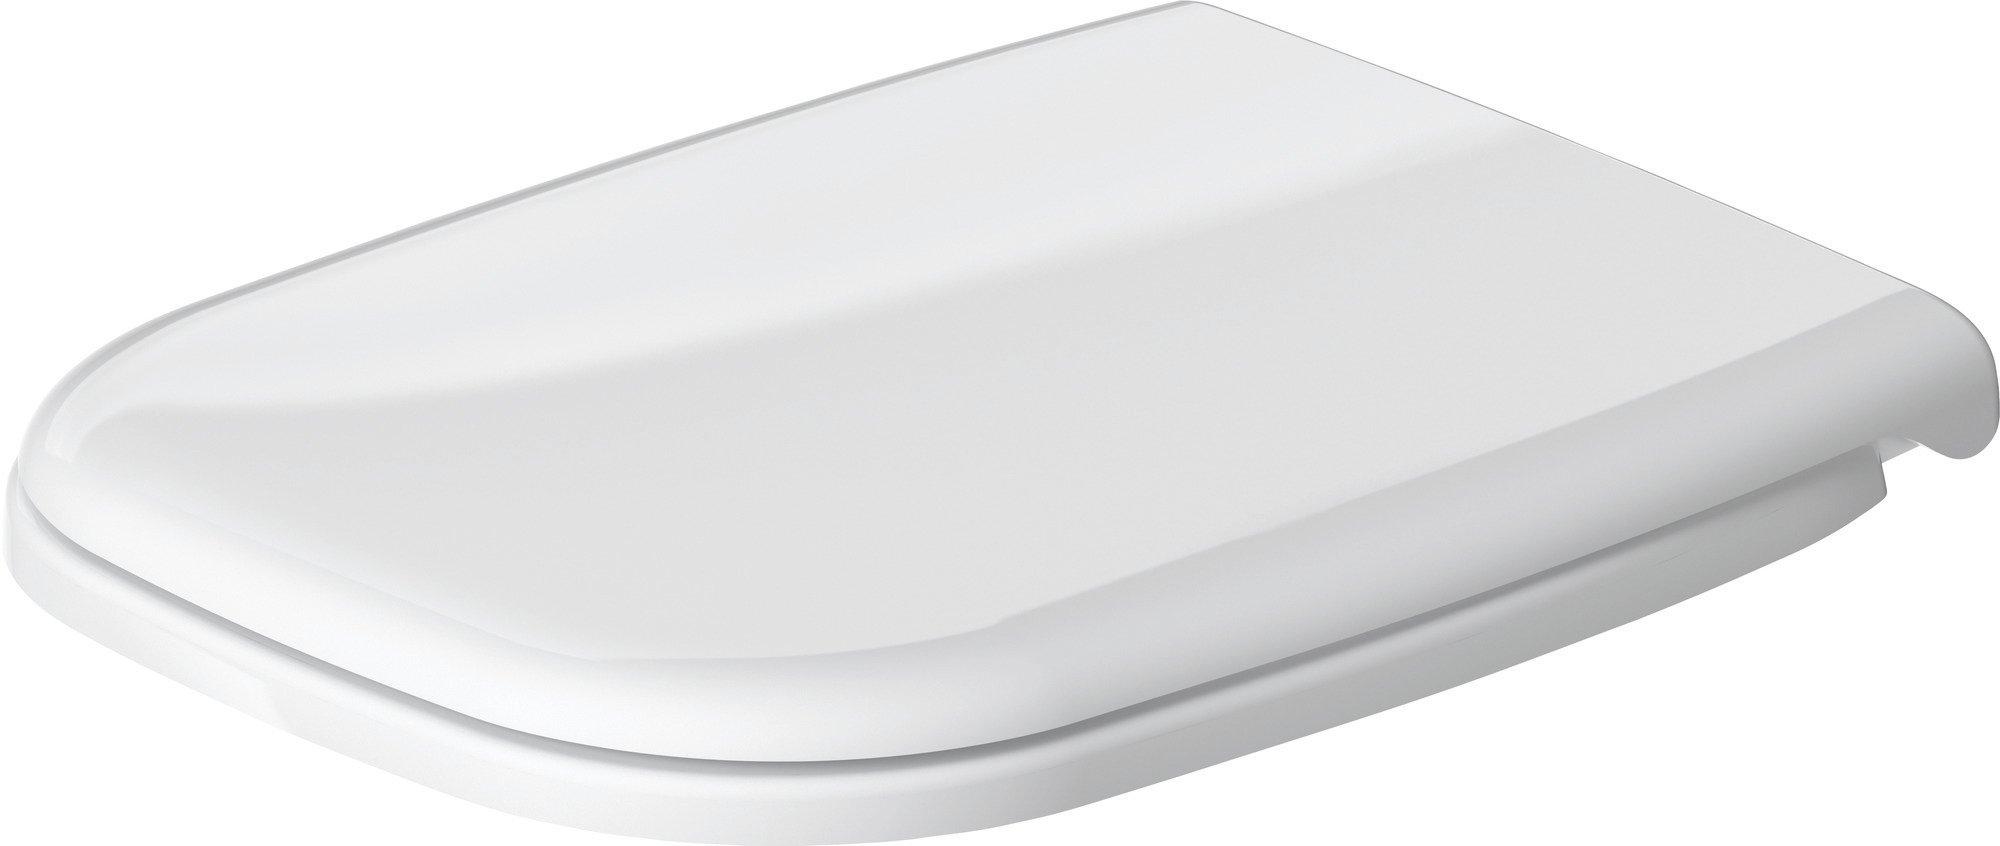 Duravit WC-Sitz D-Code ohne SoftClose